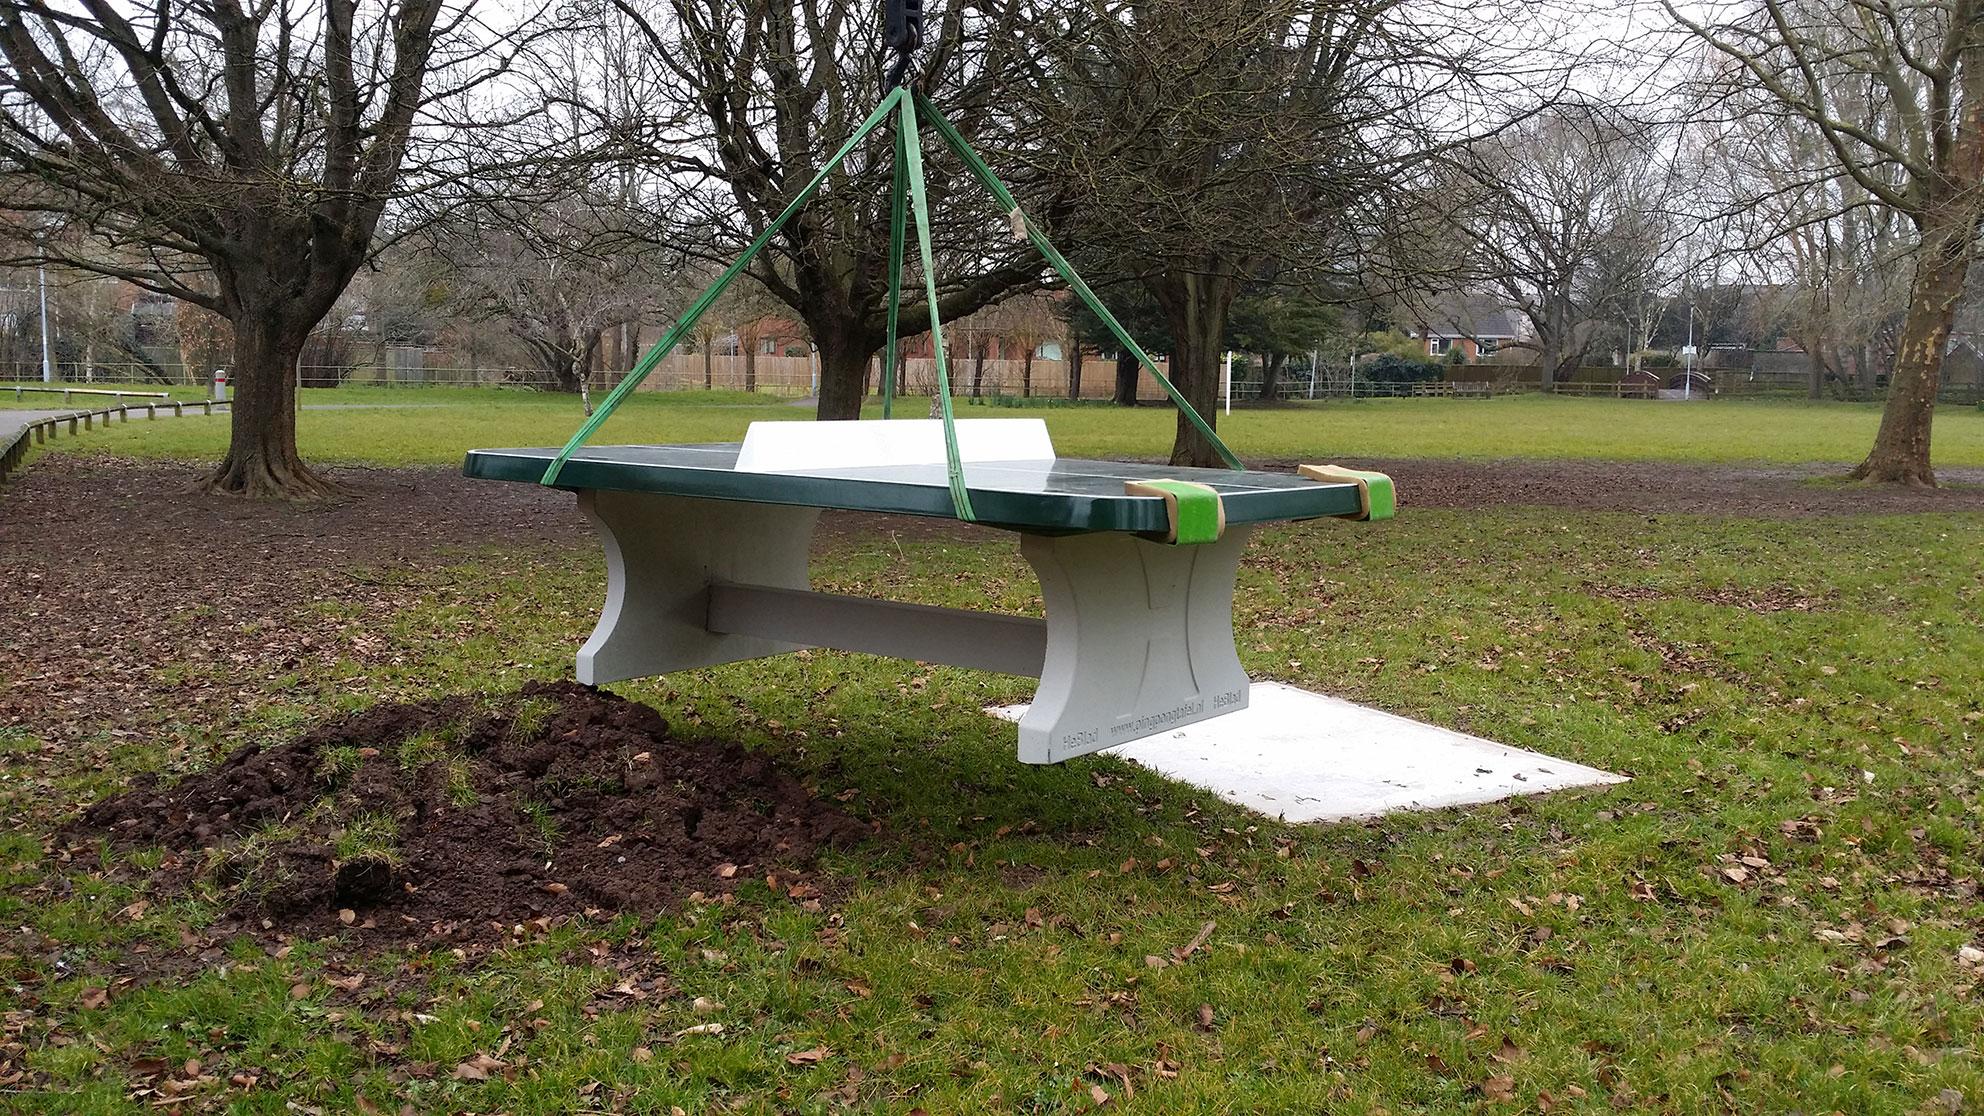 table-tennis-installation-service-uk.jpg